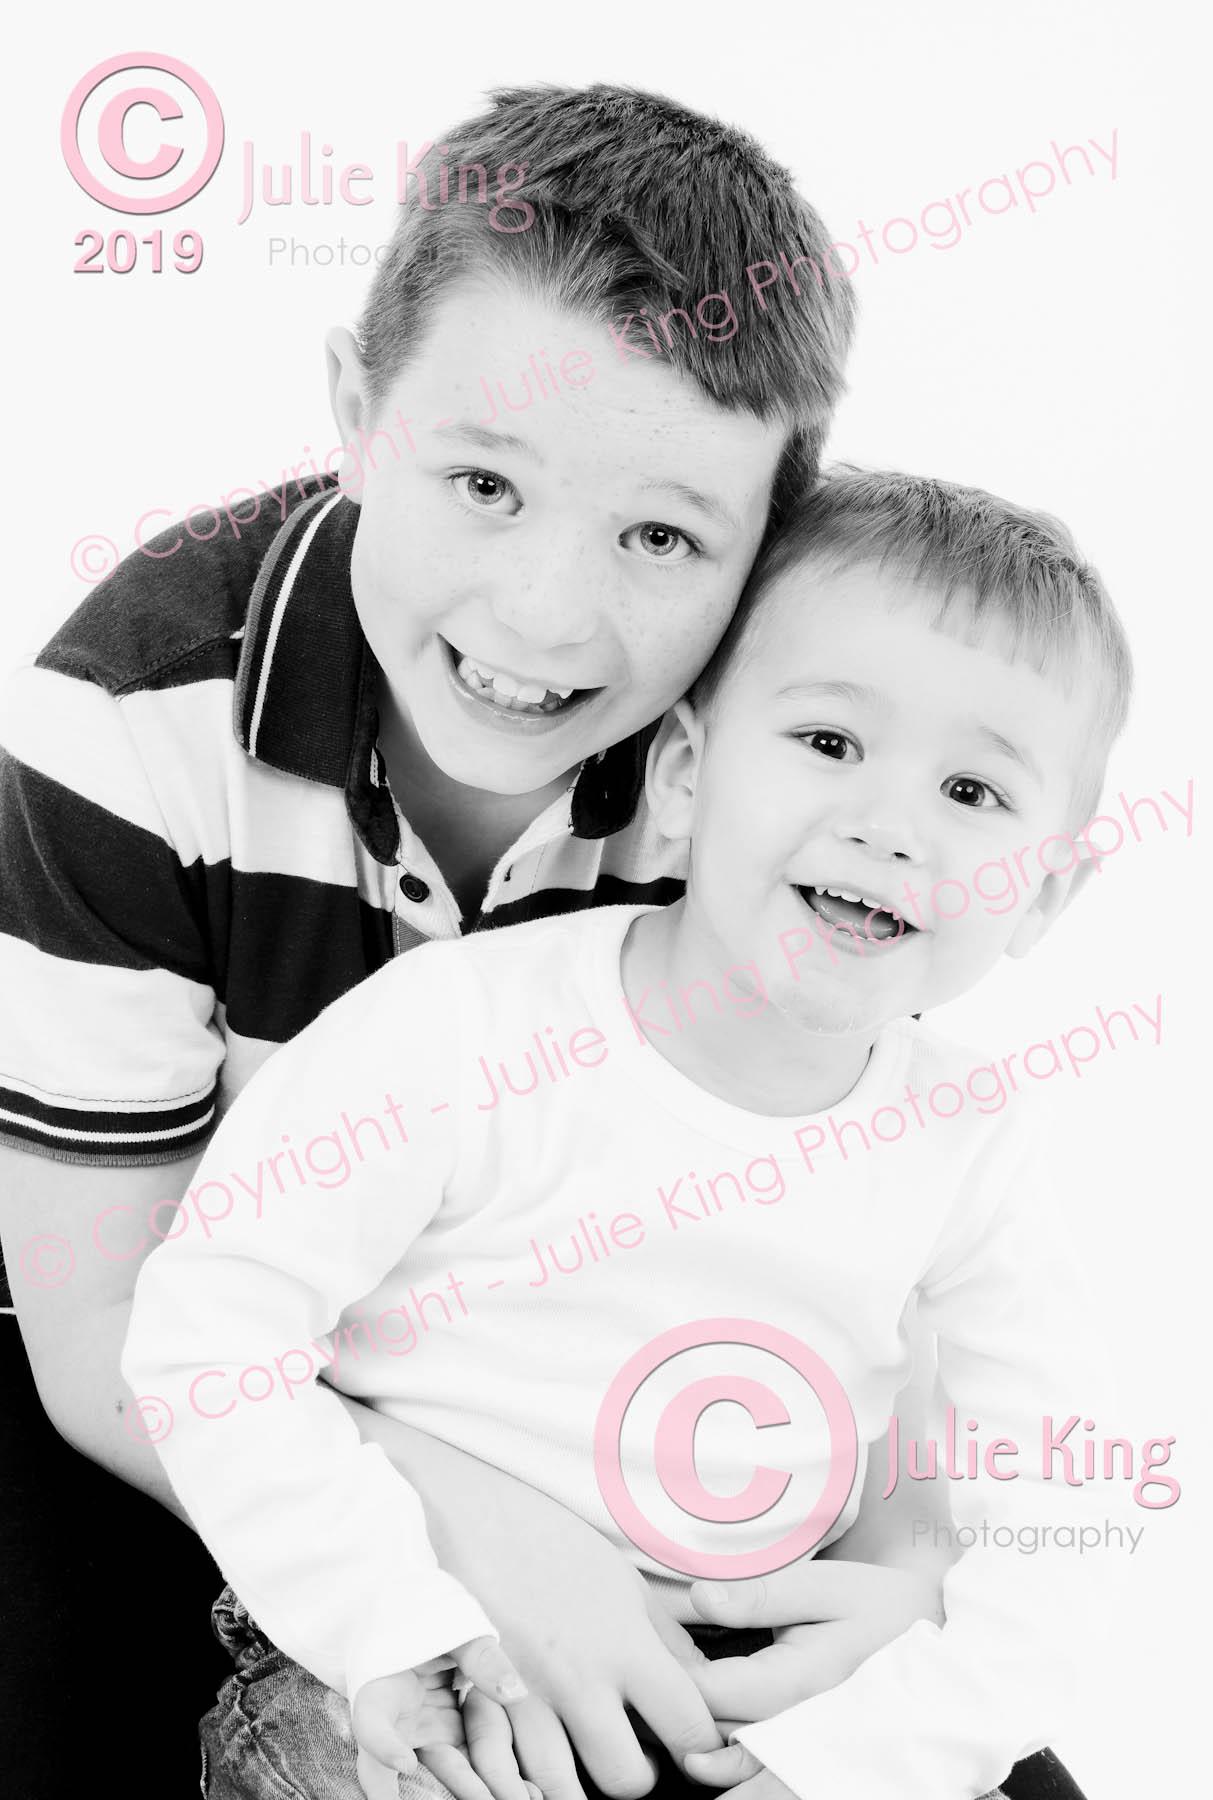 Children's portraits Bromsgrove, Experienced Photographer, Family portraits, Family Portraits Worcester, Group family portraits